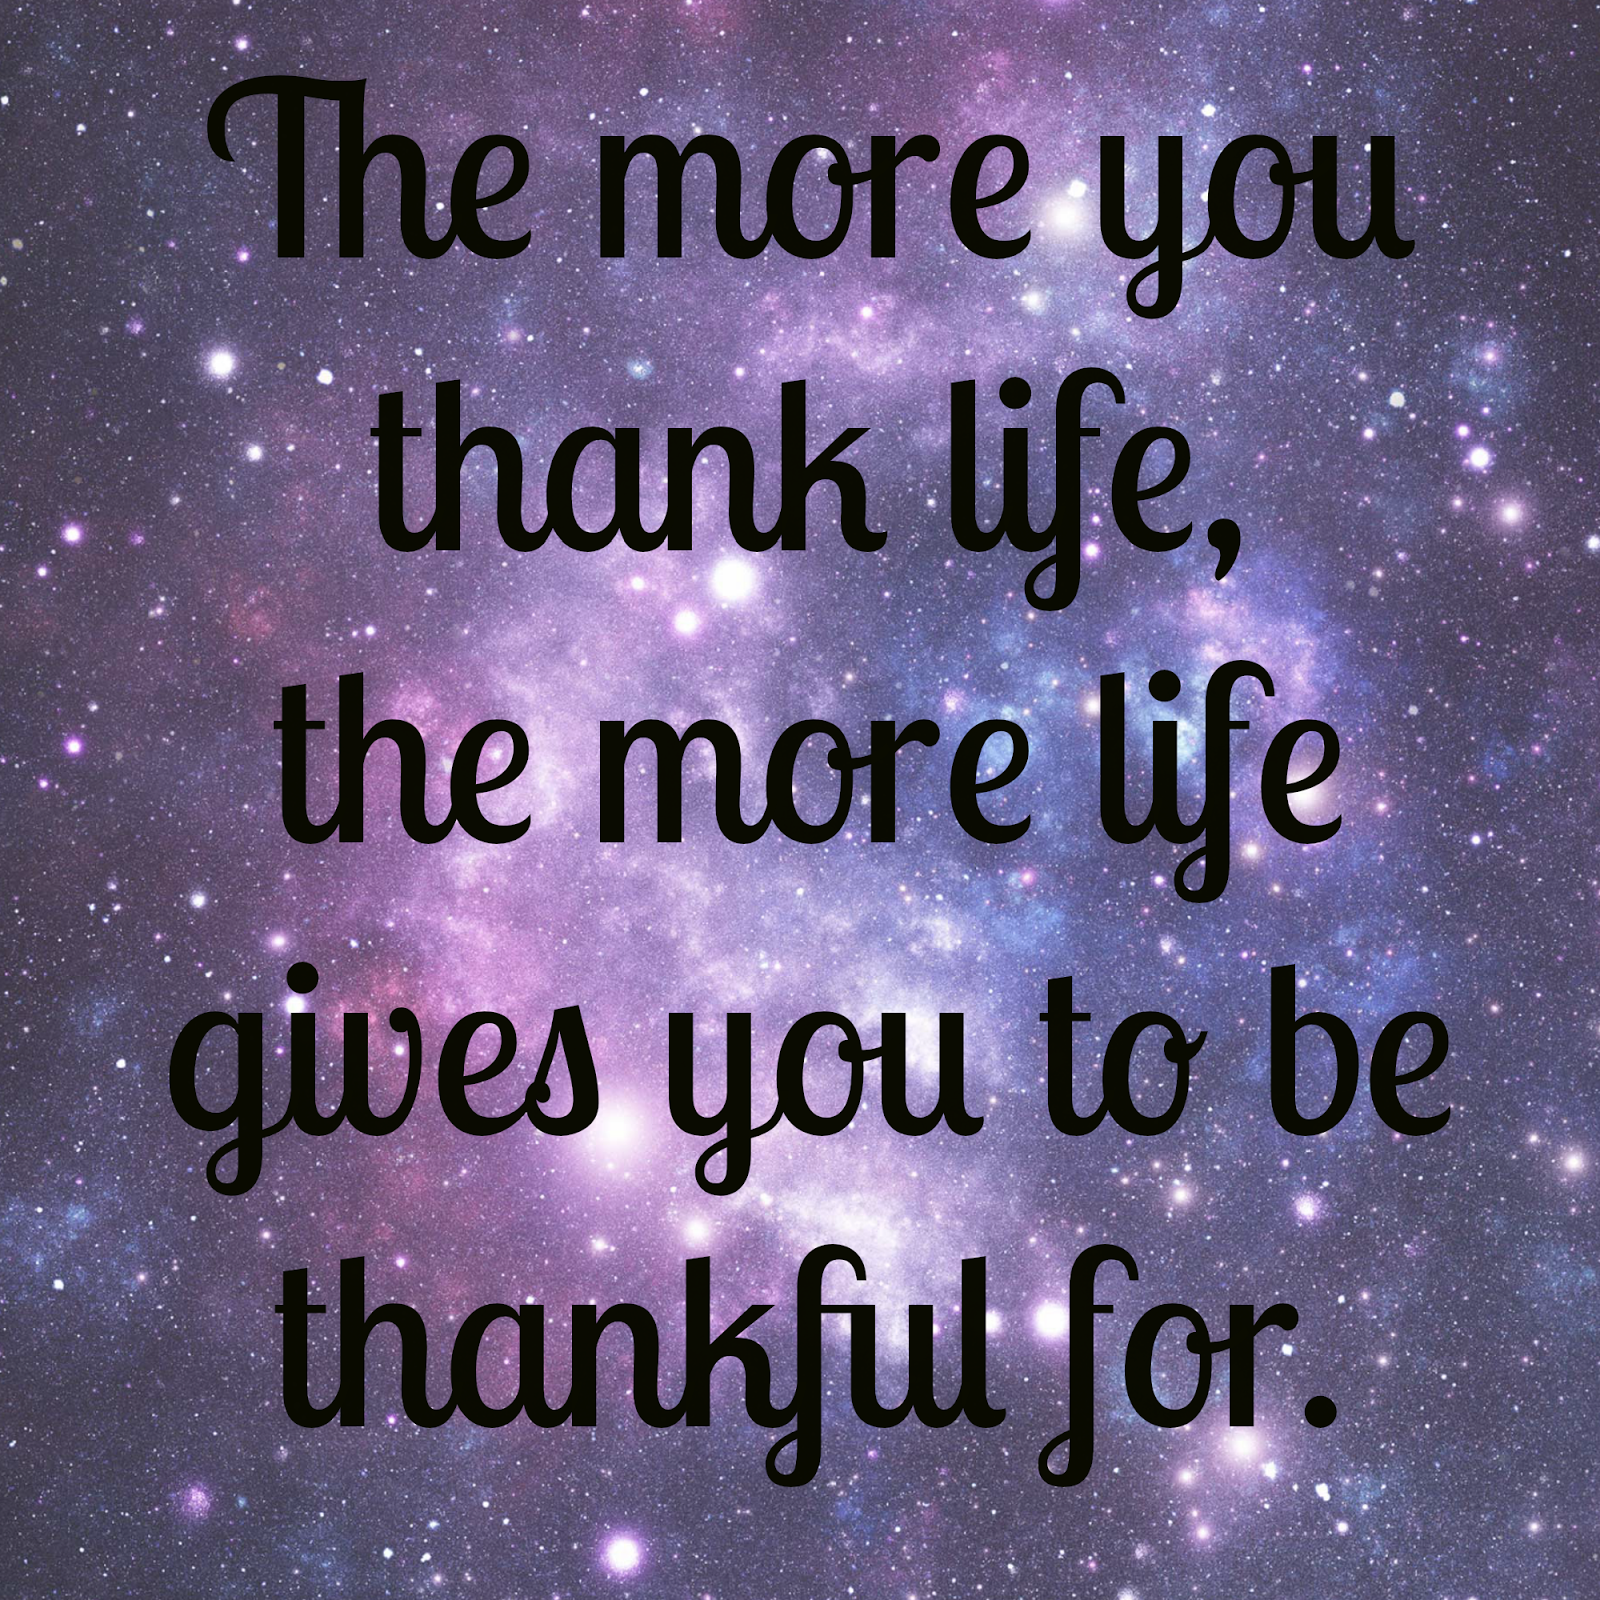 grateful_ittid.png